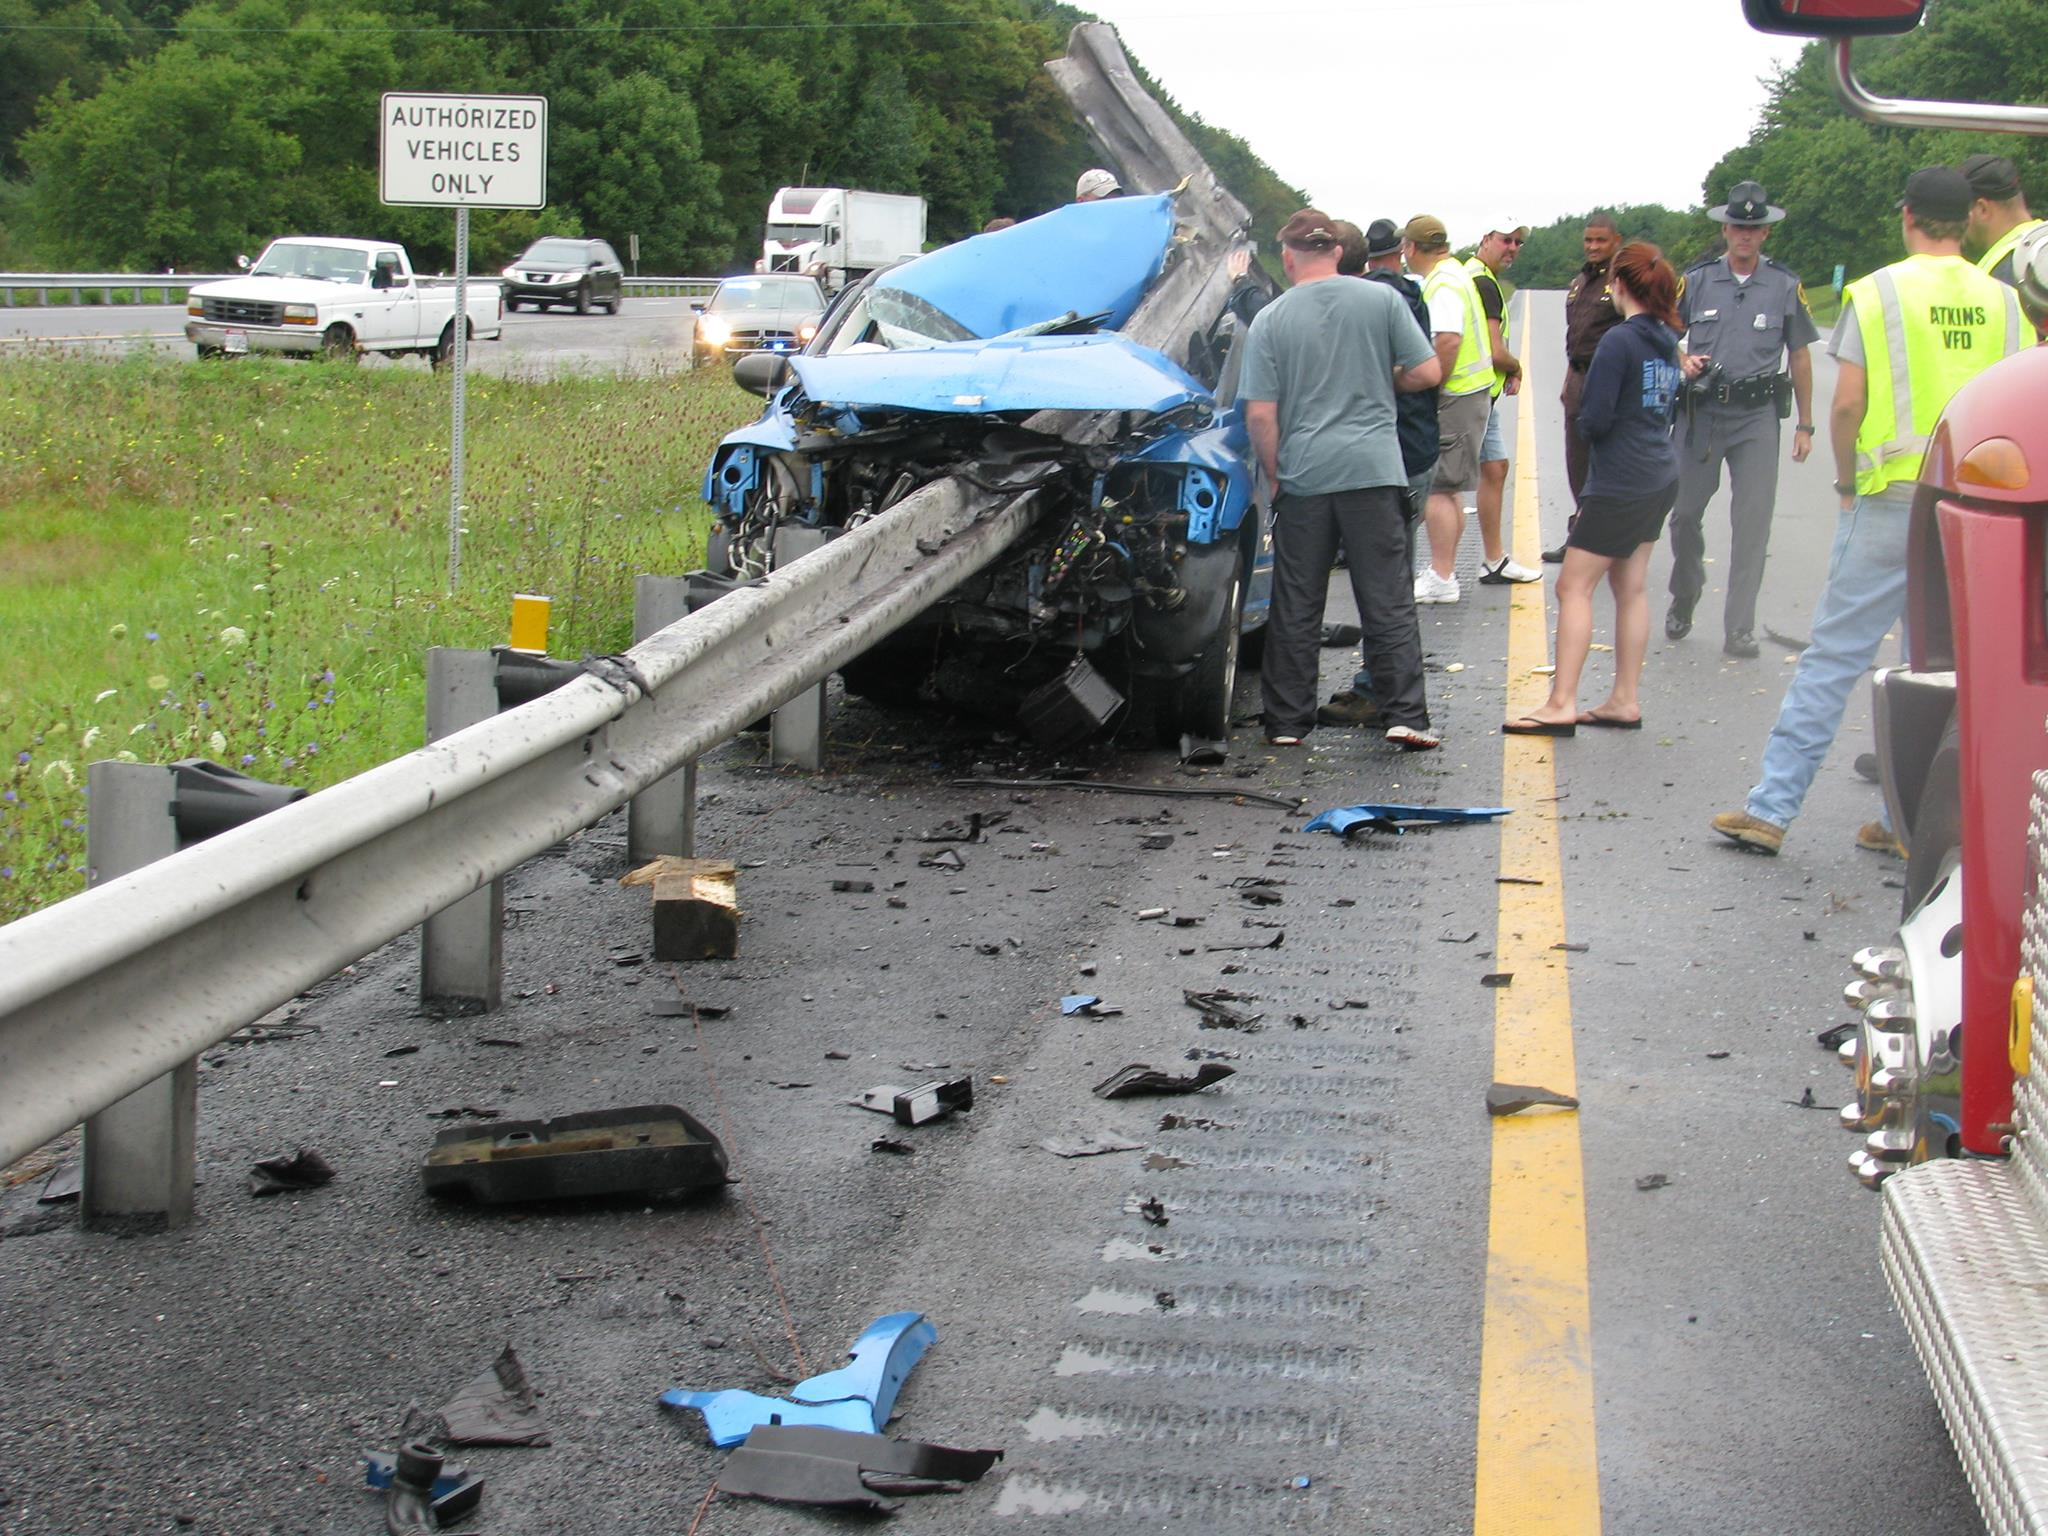 Crazy Car Accident